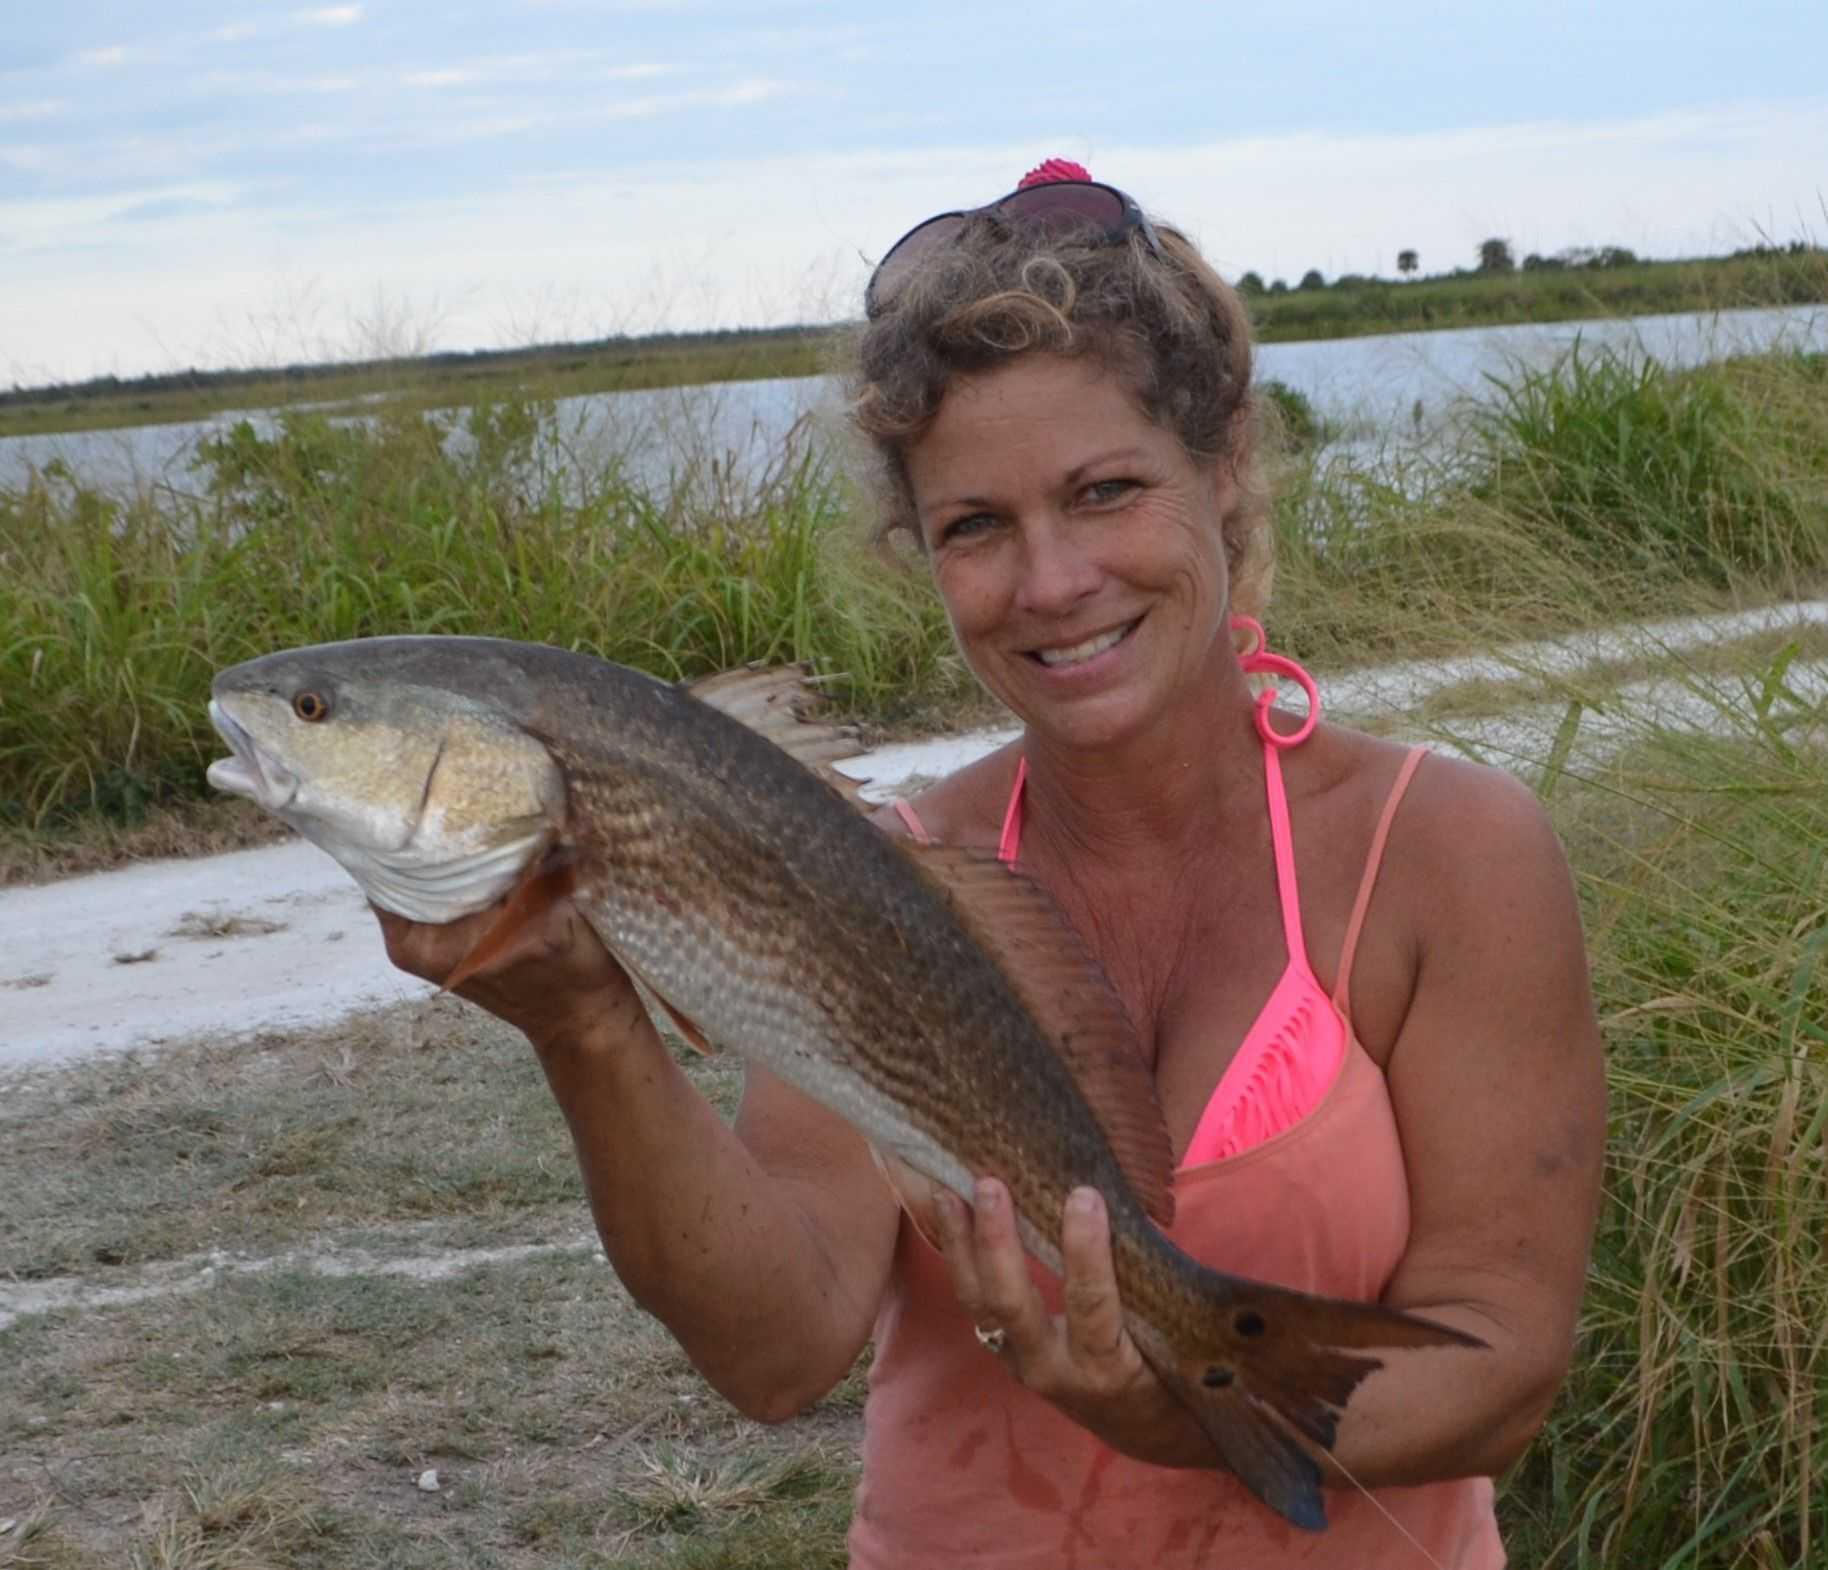 Trout stringer coastal angler the angler magazine for Eastern fly fishing magazine